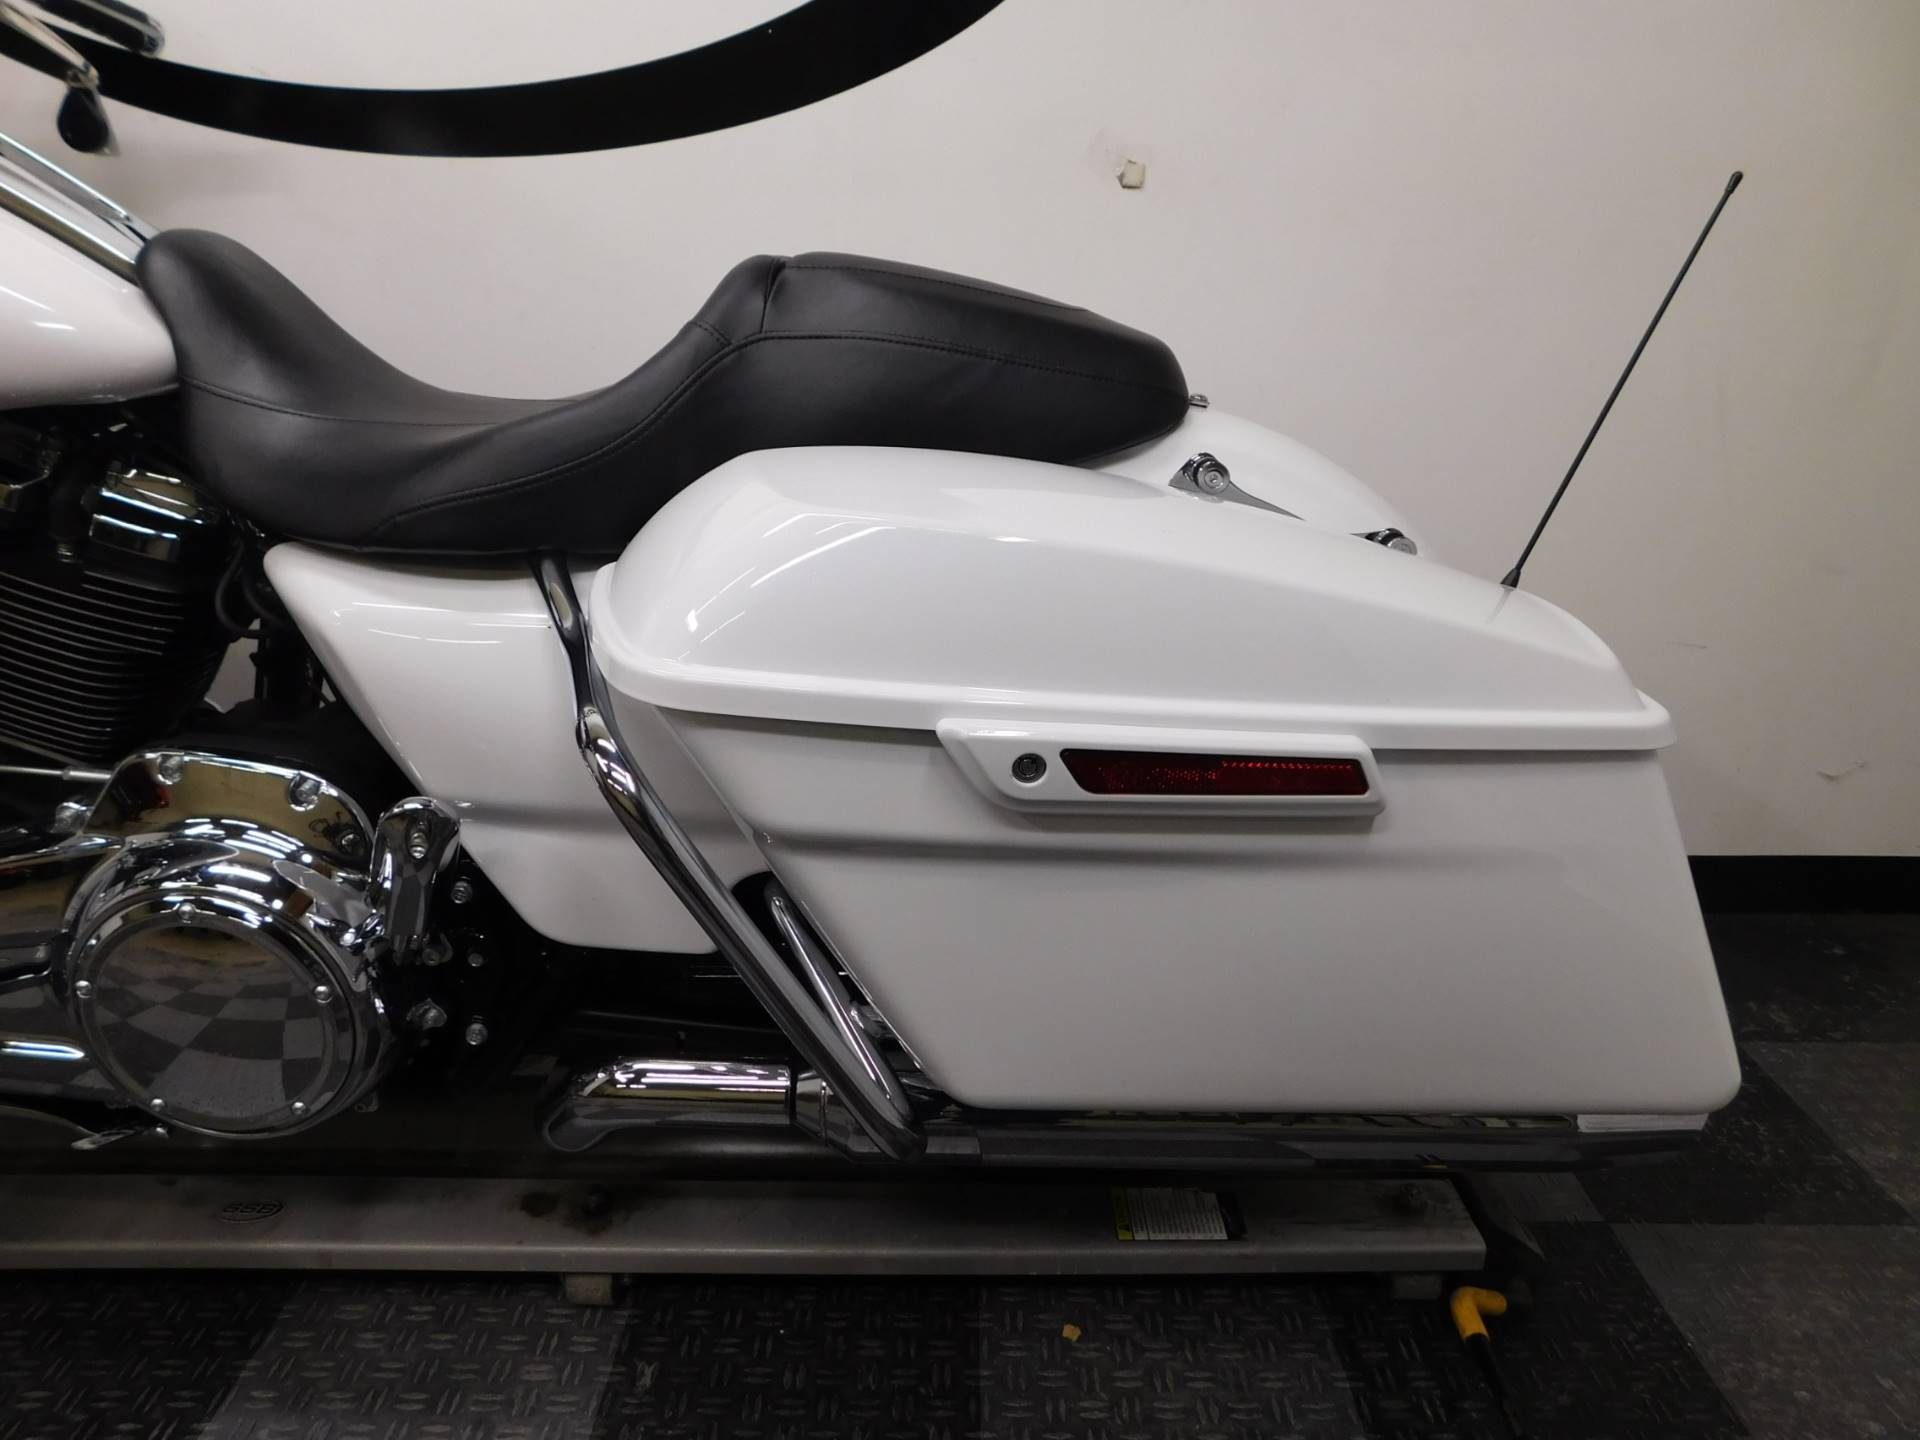 2017 Harley-Davidson Street Glide Special 10